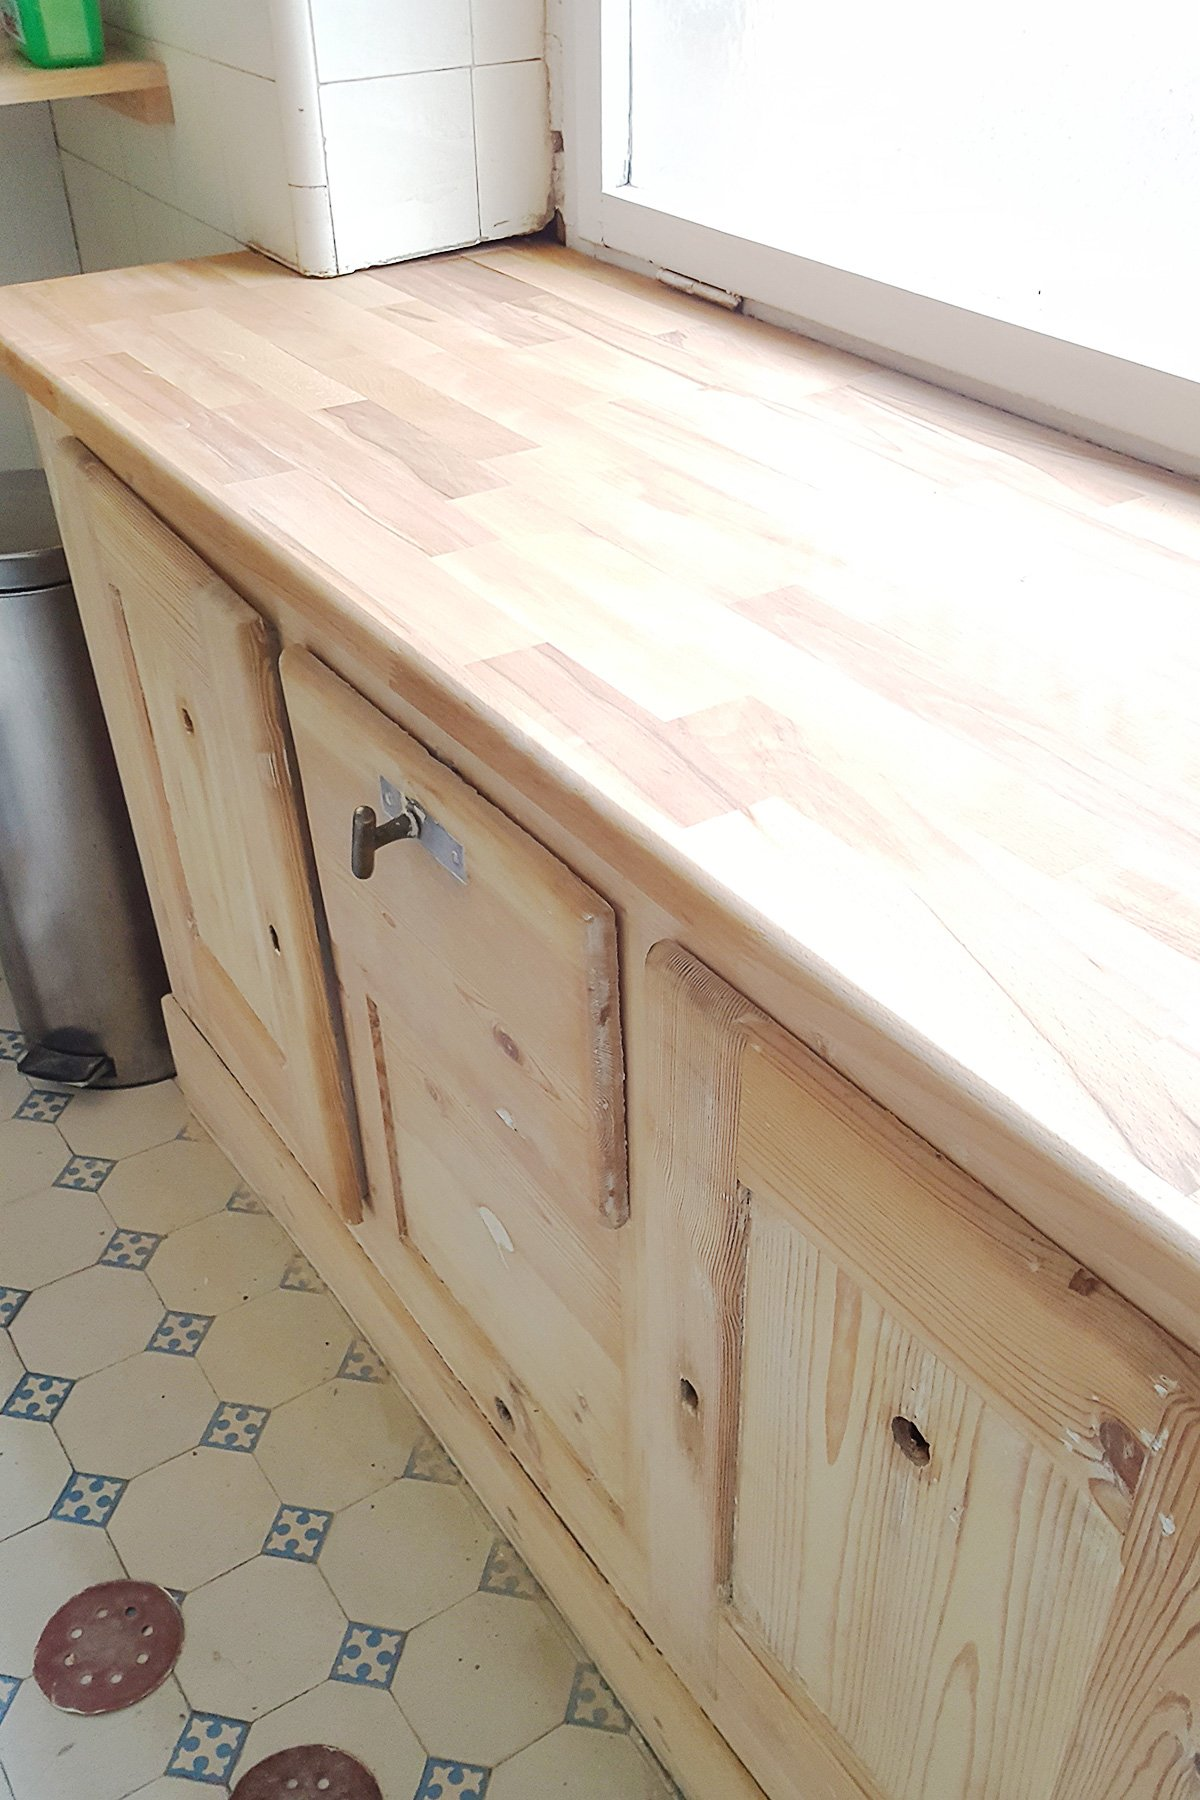 Antique Fridge - New Countertop | Little House On The Corner